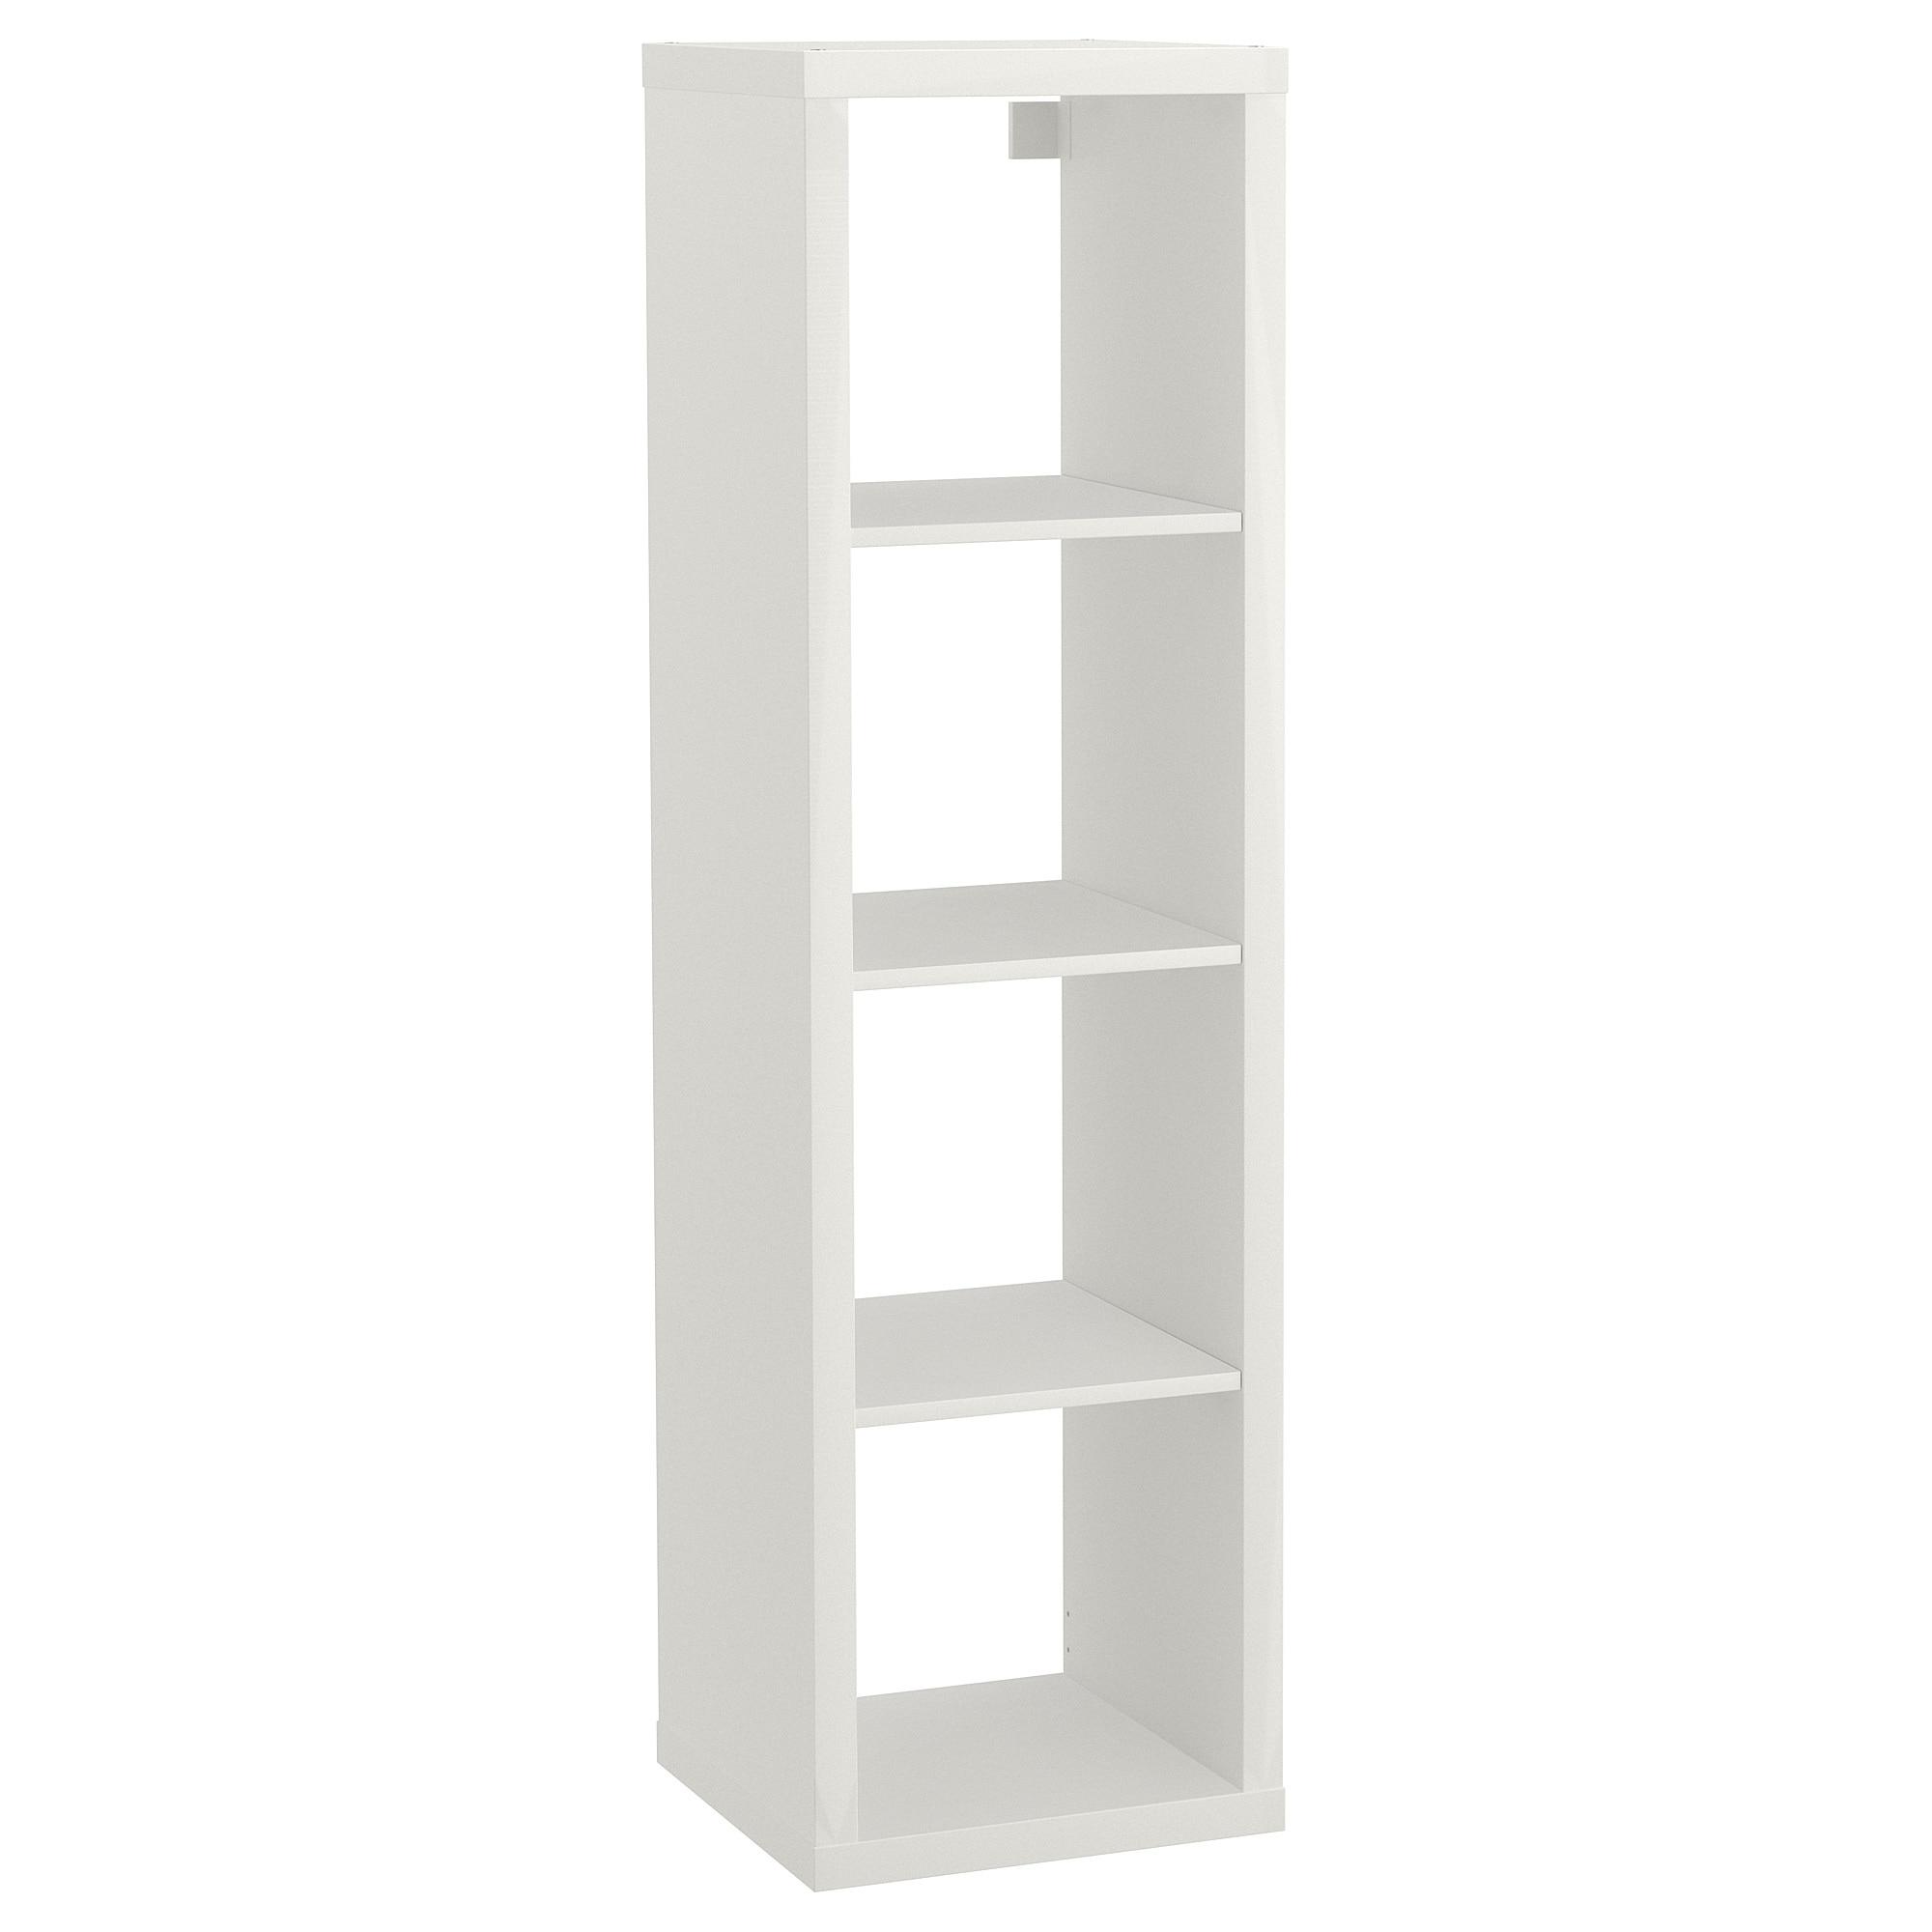 Mueble Estanteria Nkde Kallax Estanterà A Blanco 42 X 147 Cm Ikea